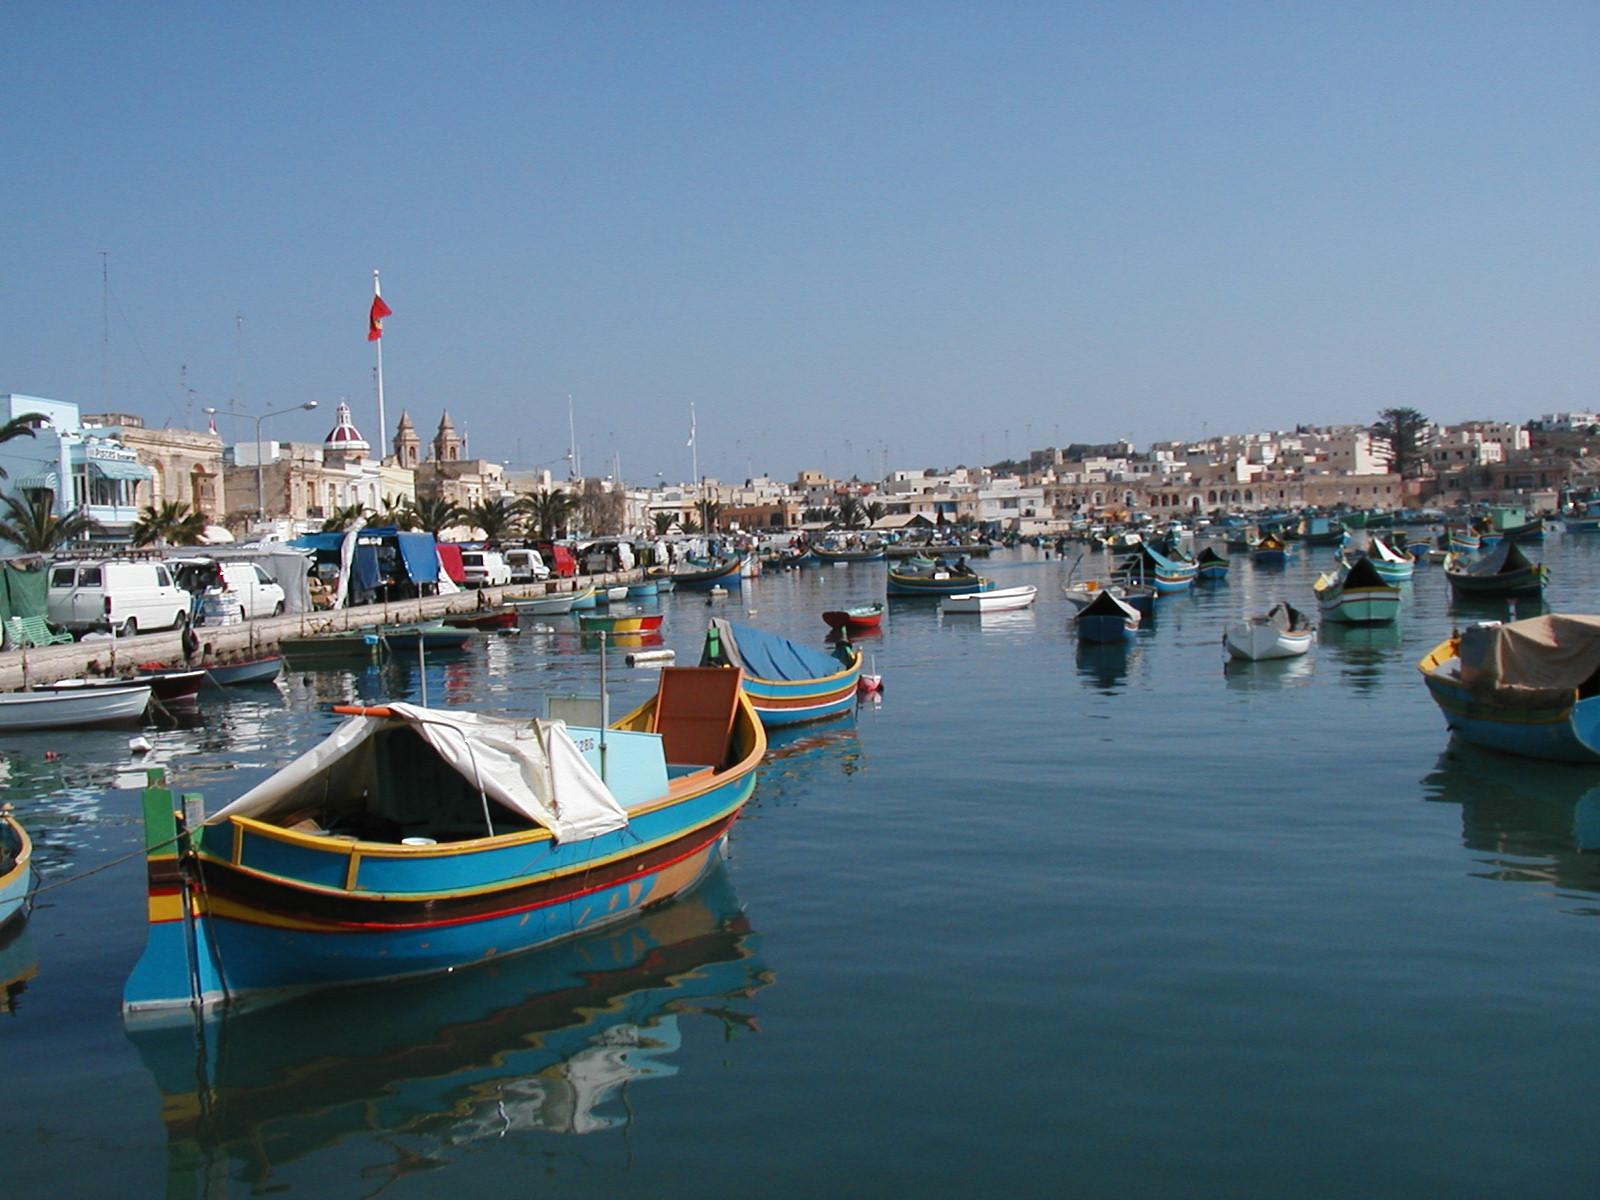 Обои Мальта, malta xlokk, malta, Залив, Marsaxlok, marsaxlokk bay, марсашлокк. Города foto 19